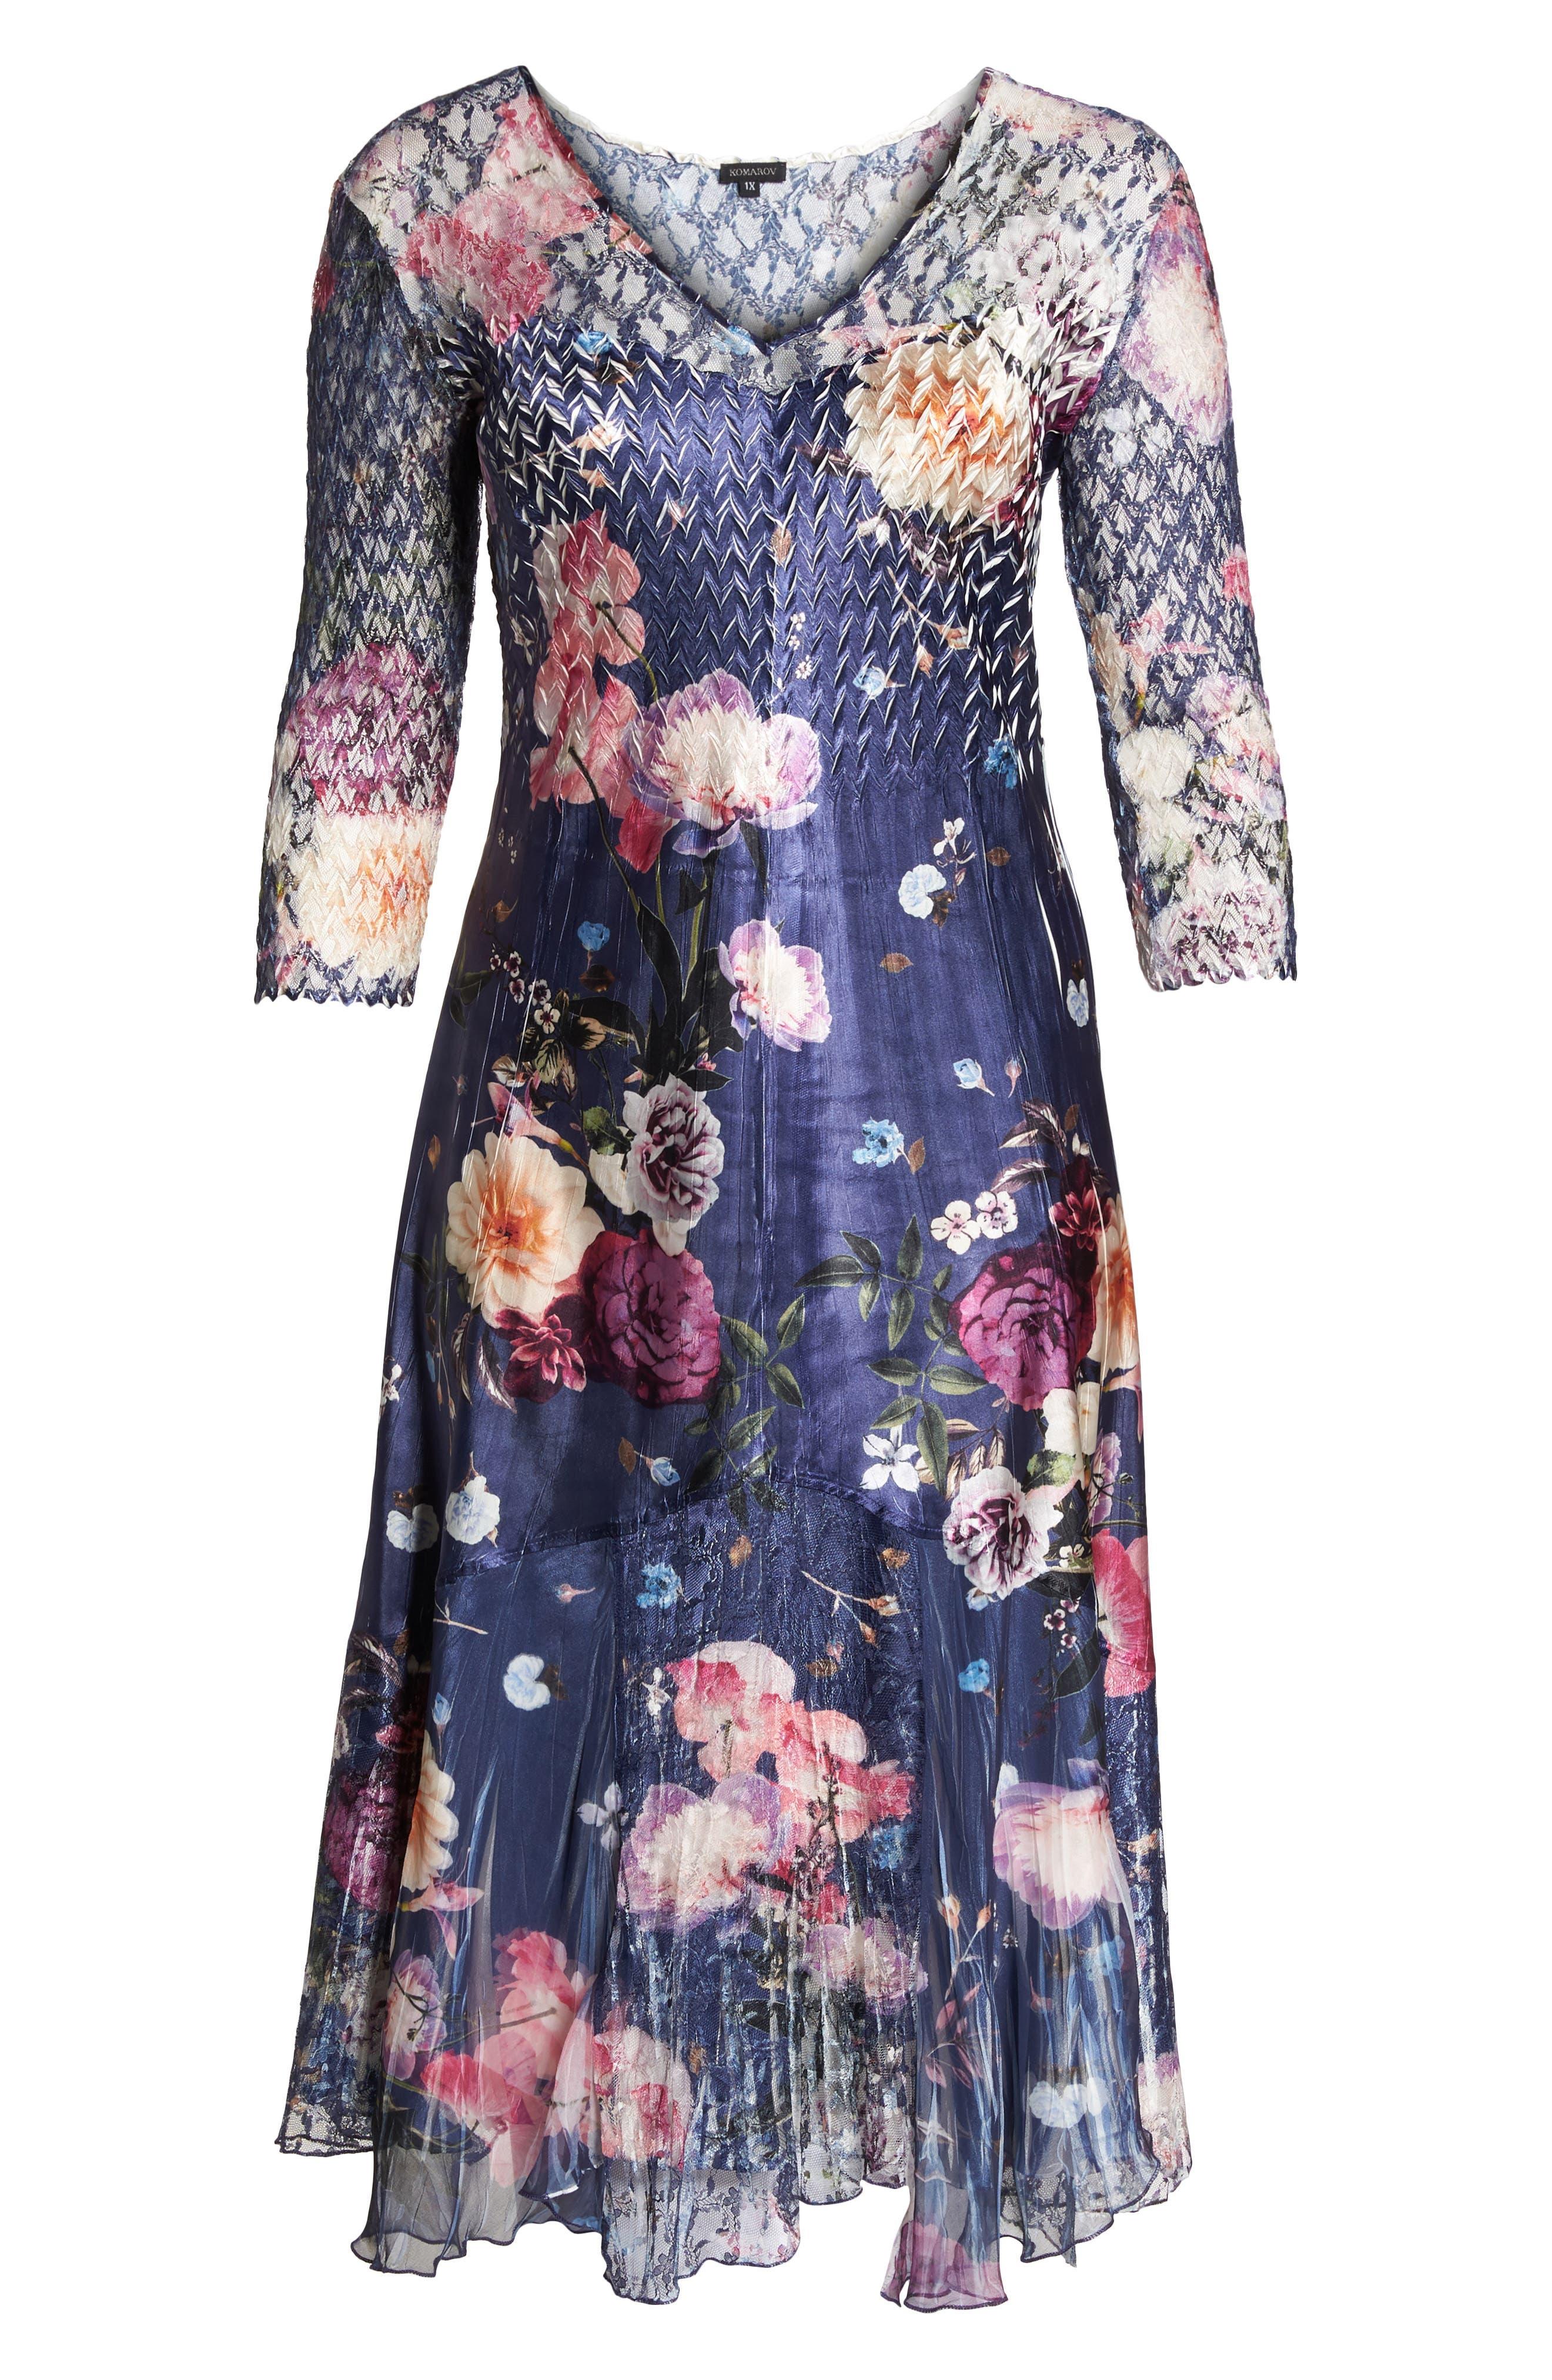 Koramov Floral Print Lace Inset Dress,                             Alternate thumbnail 6, color,                             500